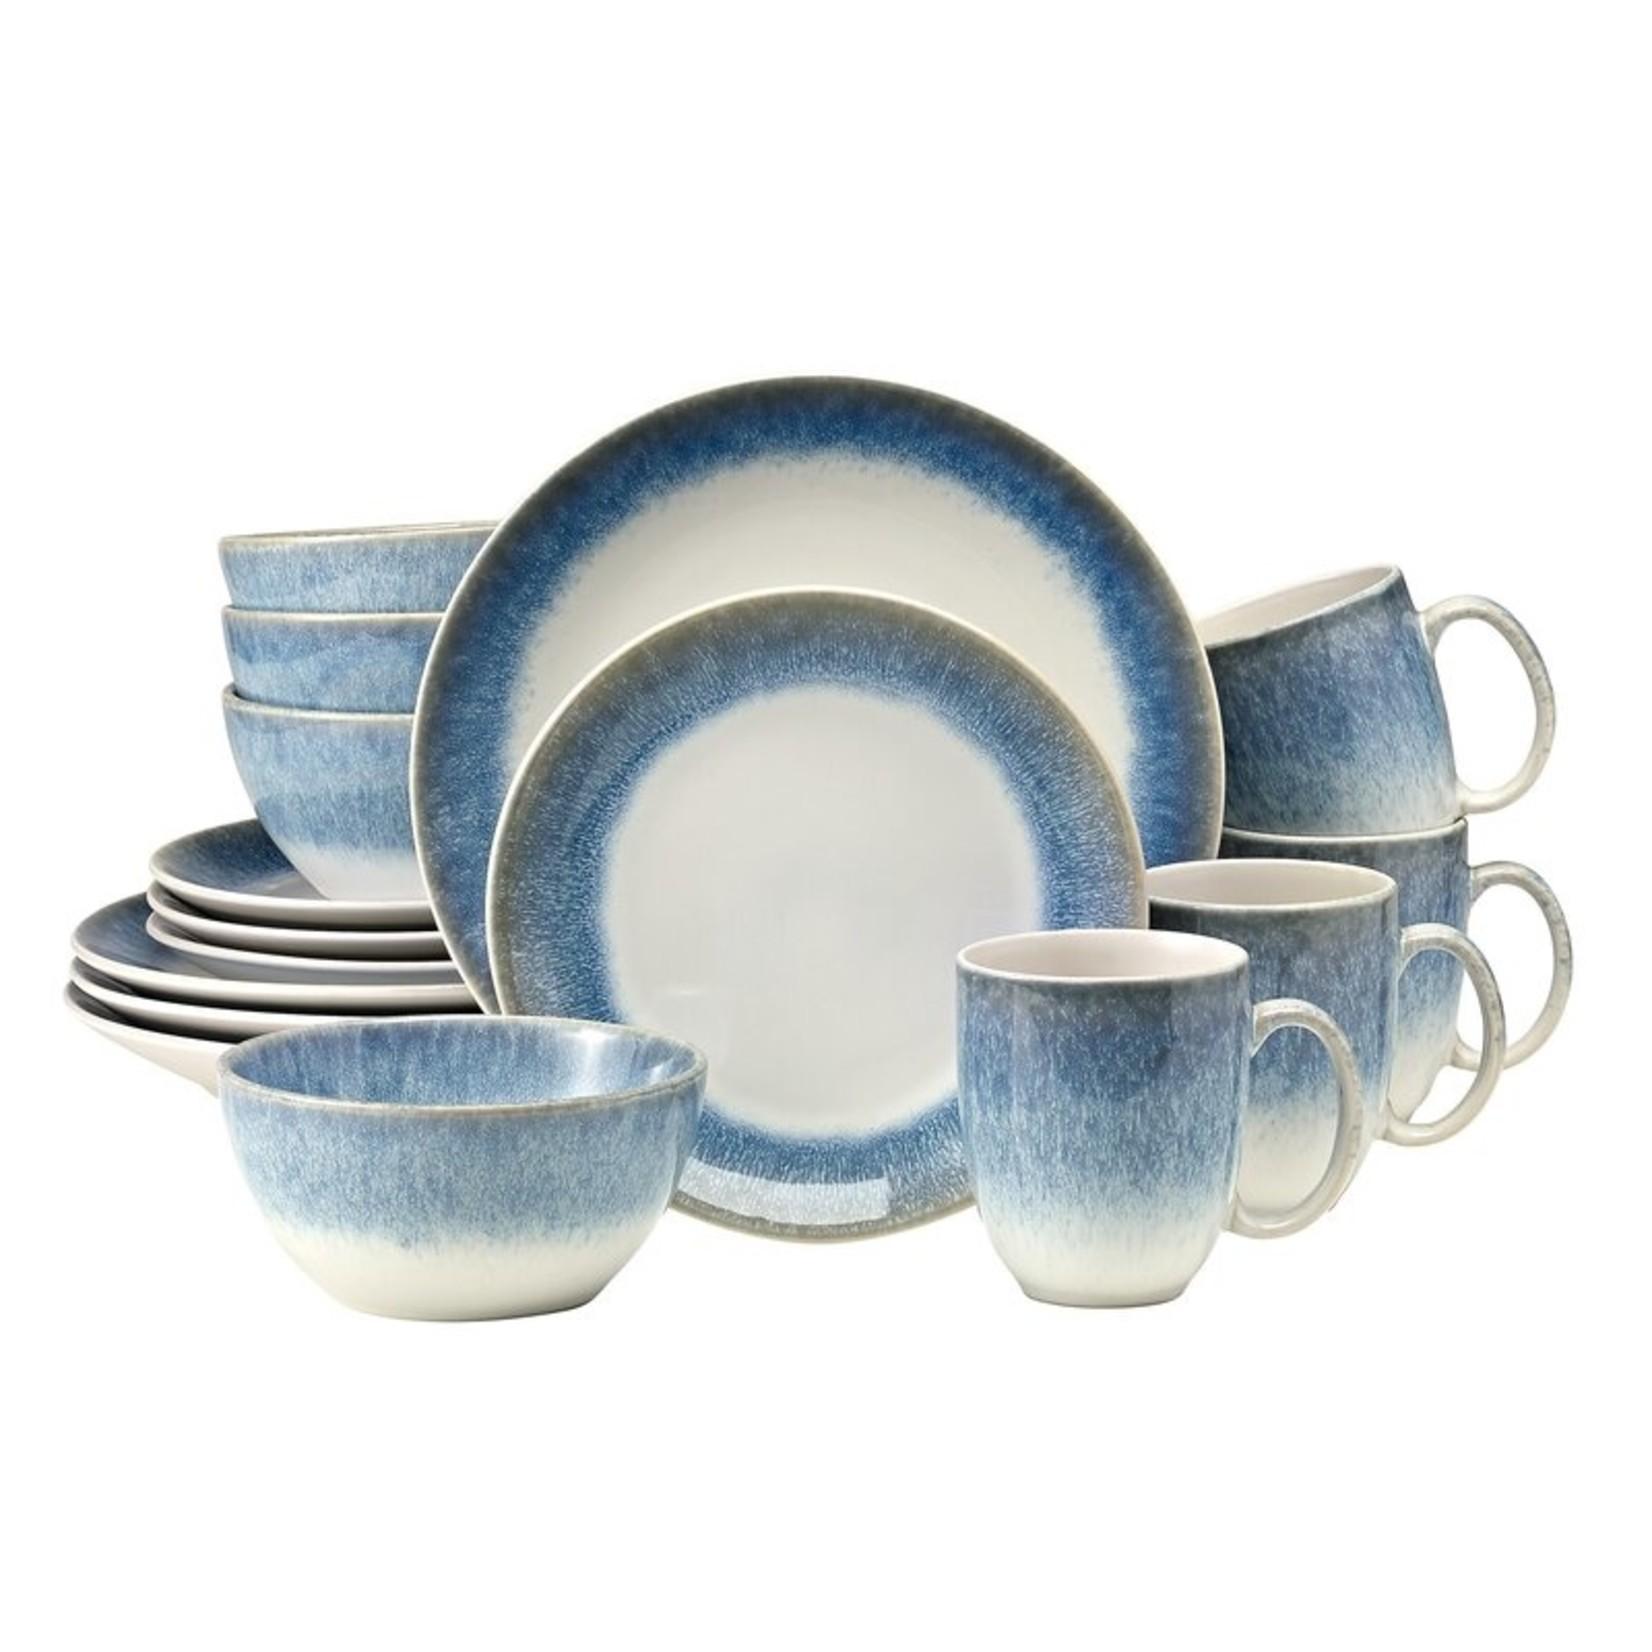 *Meadow 16 piece Dinnerware Set - Service for 4